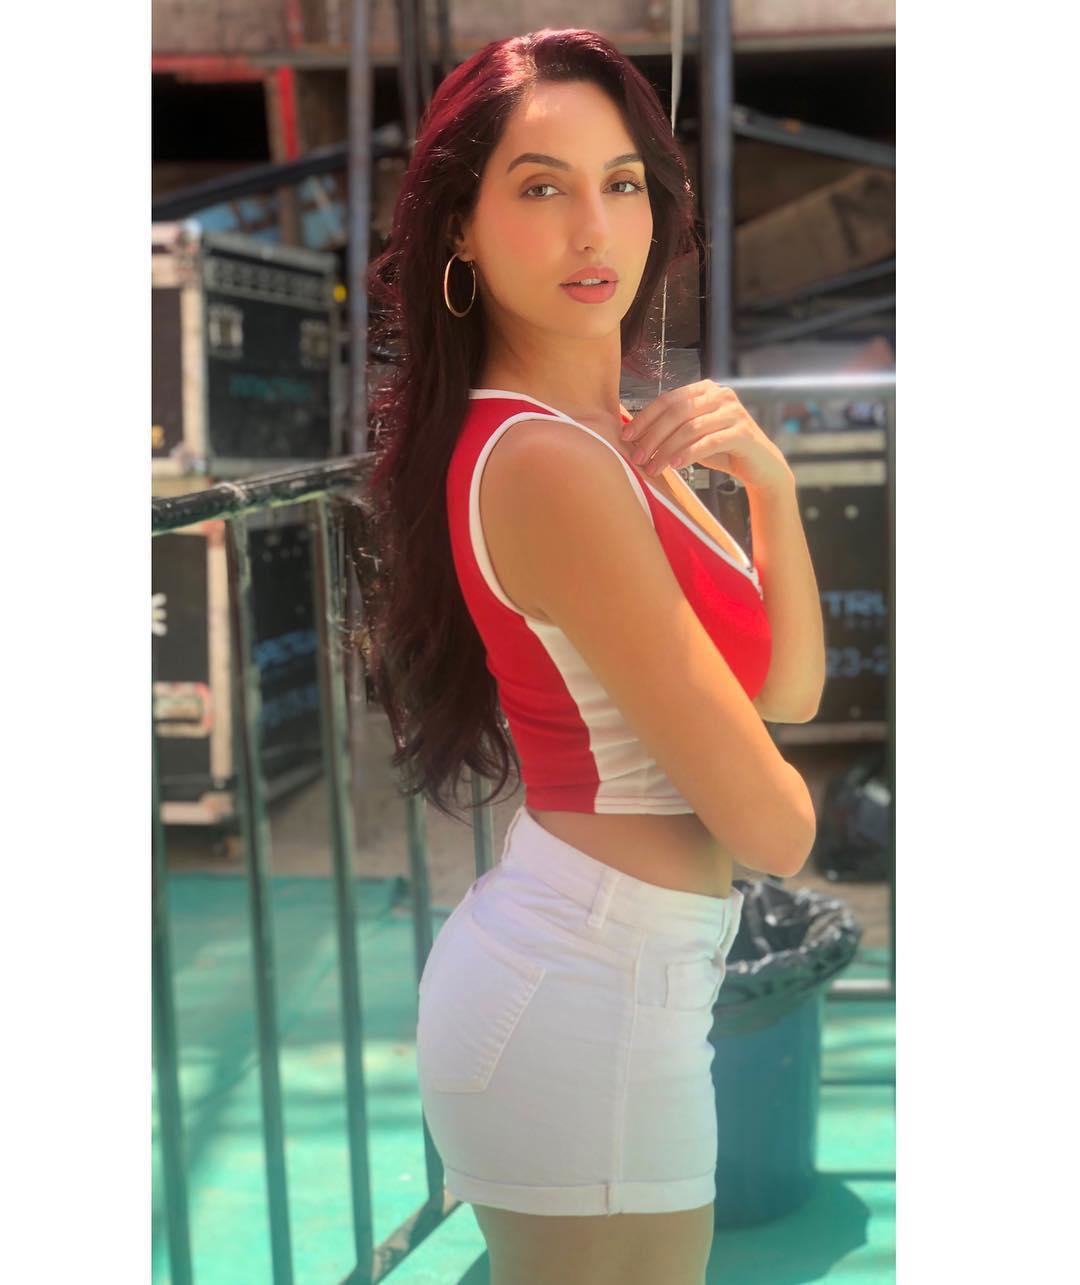 Glamorous Actress Nora Fatehi Latest Photos 2019, Nora Fatehi, Nora Fatehi Exclusive HOT Photos download, Nora Fatehi Instagram pic download